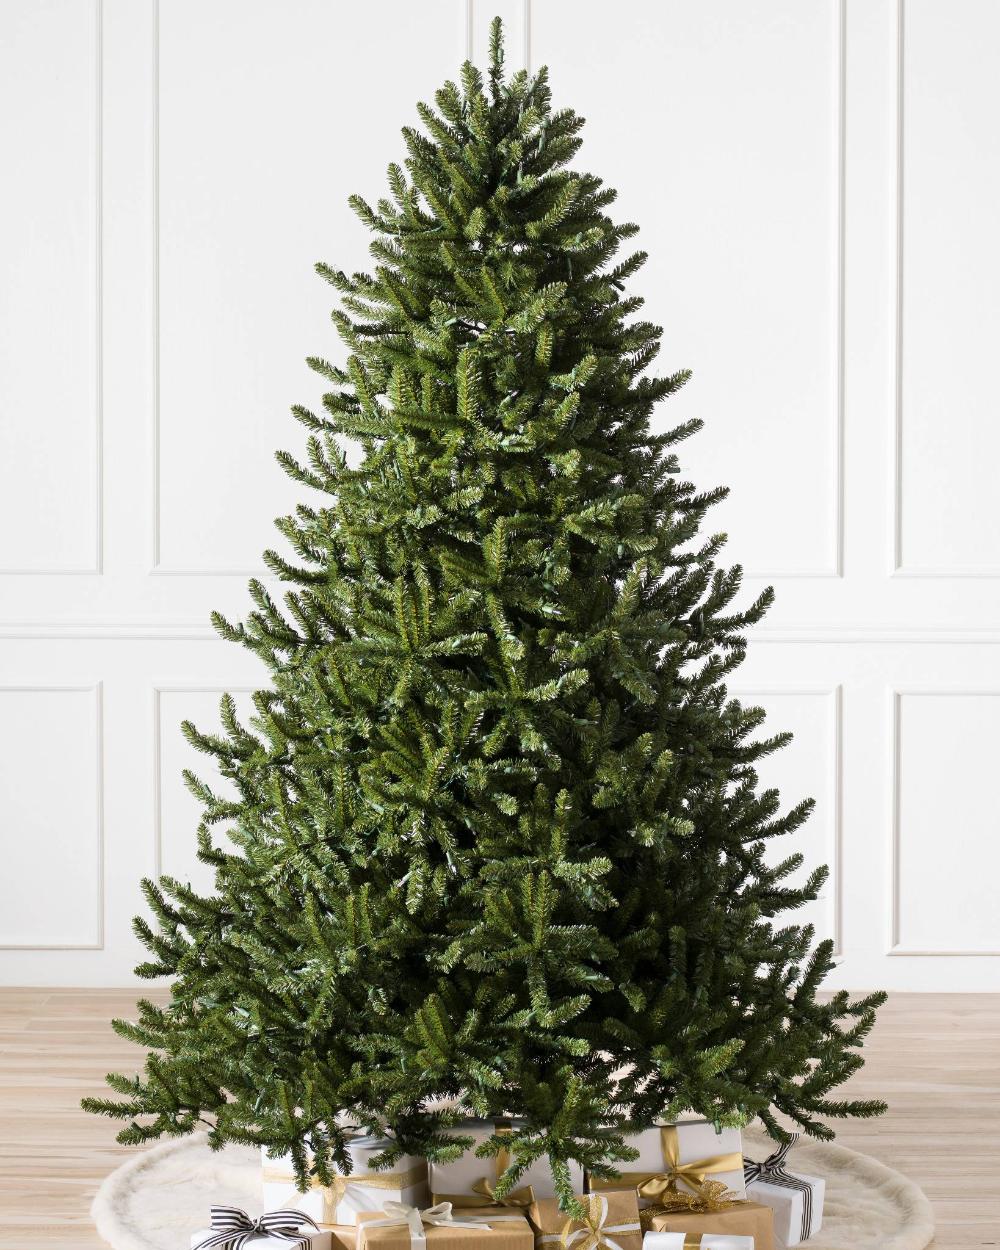 Adirondack Spruce Artificial Christmas Tree Balsam Hill Realistic Artificial Christmas Trees Cool Christmas Trees Best Artificial Christmas Trees